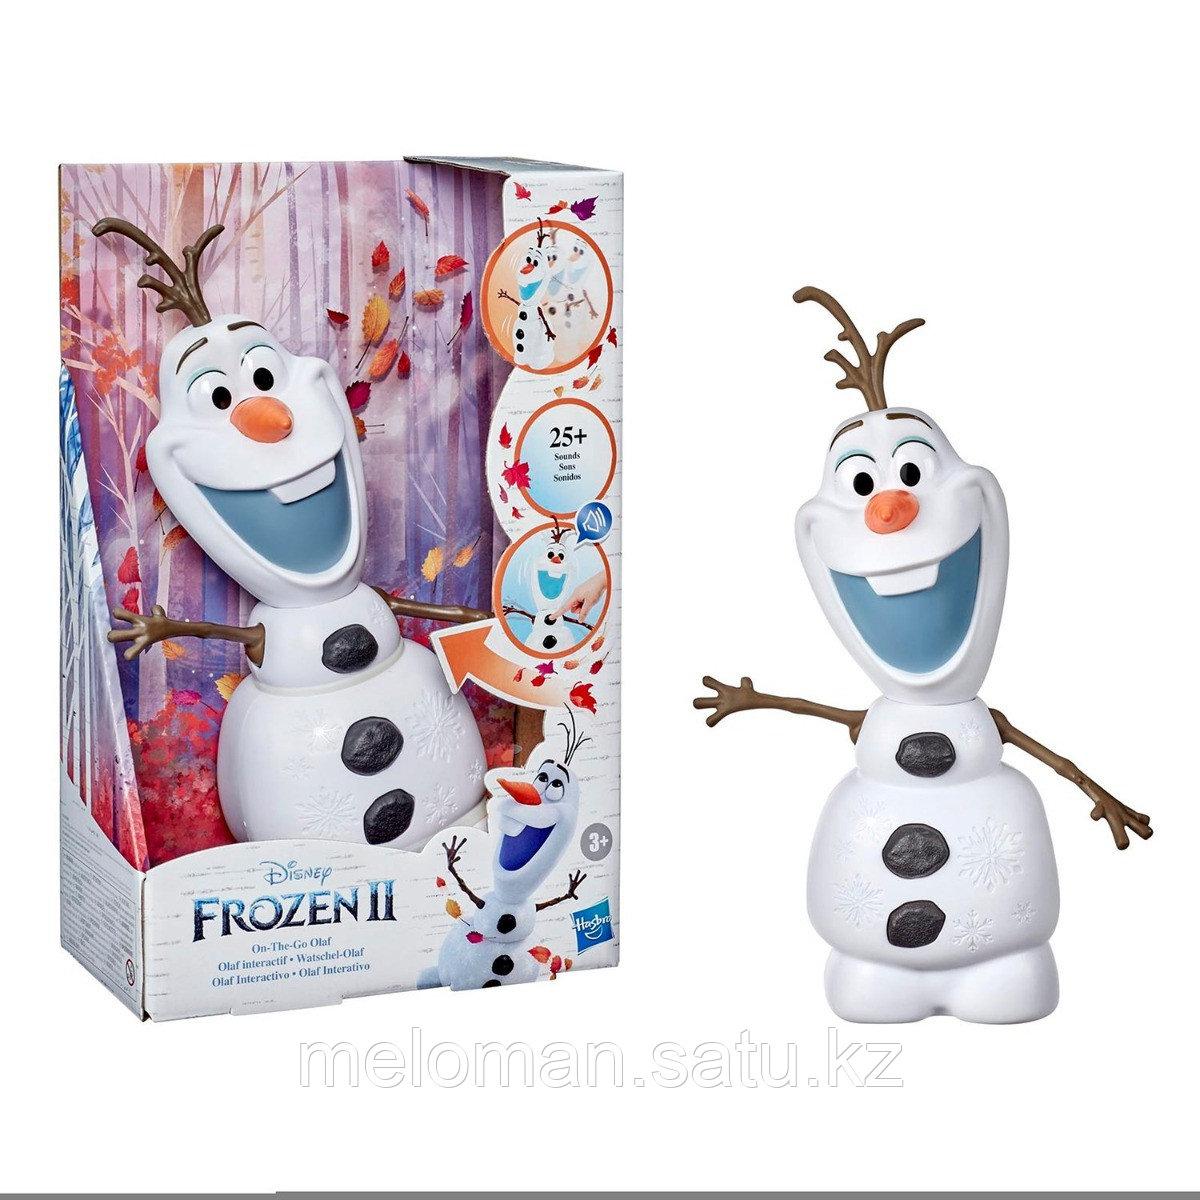 Disney Frozen: ИГРУШКА ХОЛОД СЕРД2 ИНТЕРАКТИВНЫЙ ОЛАФ - фото 3